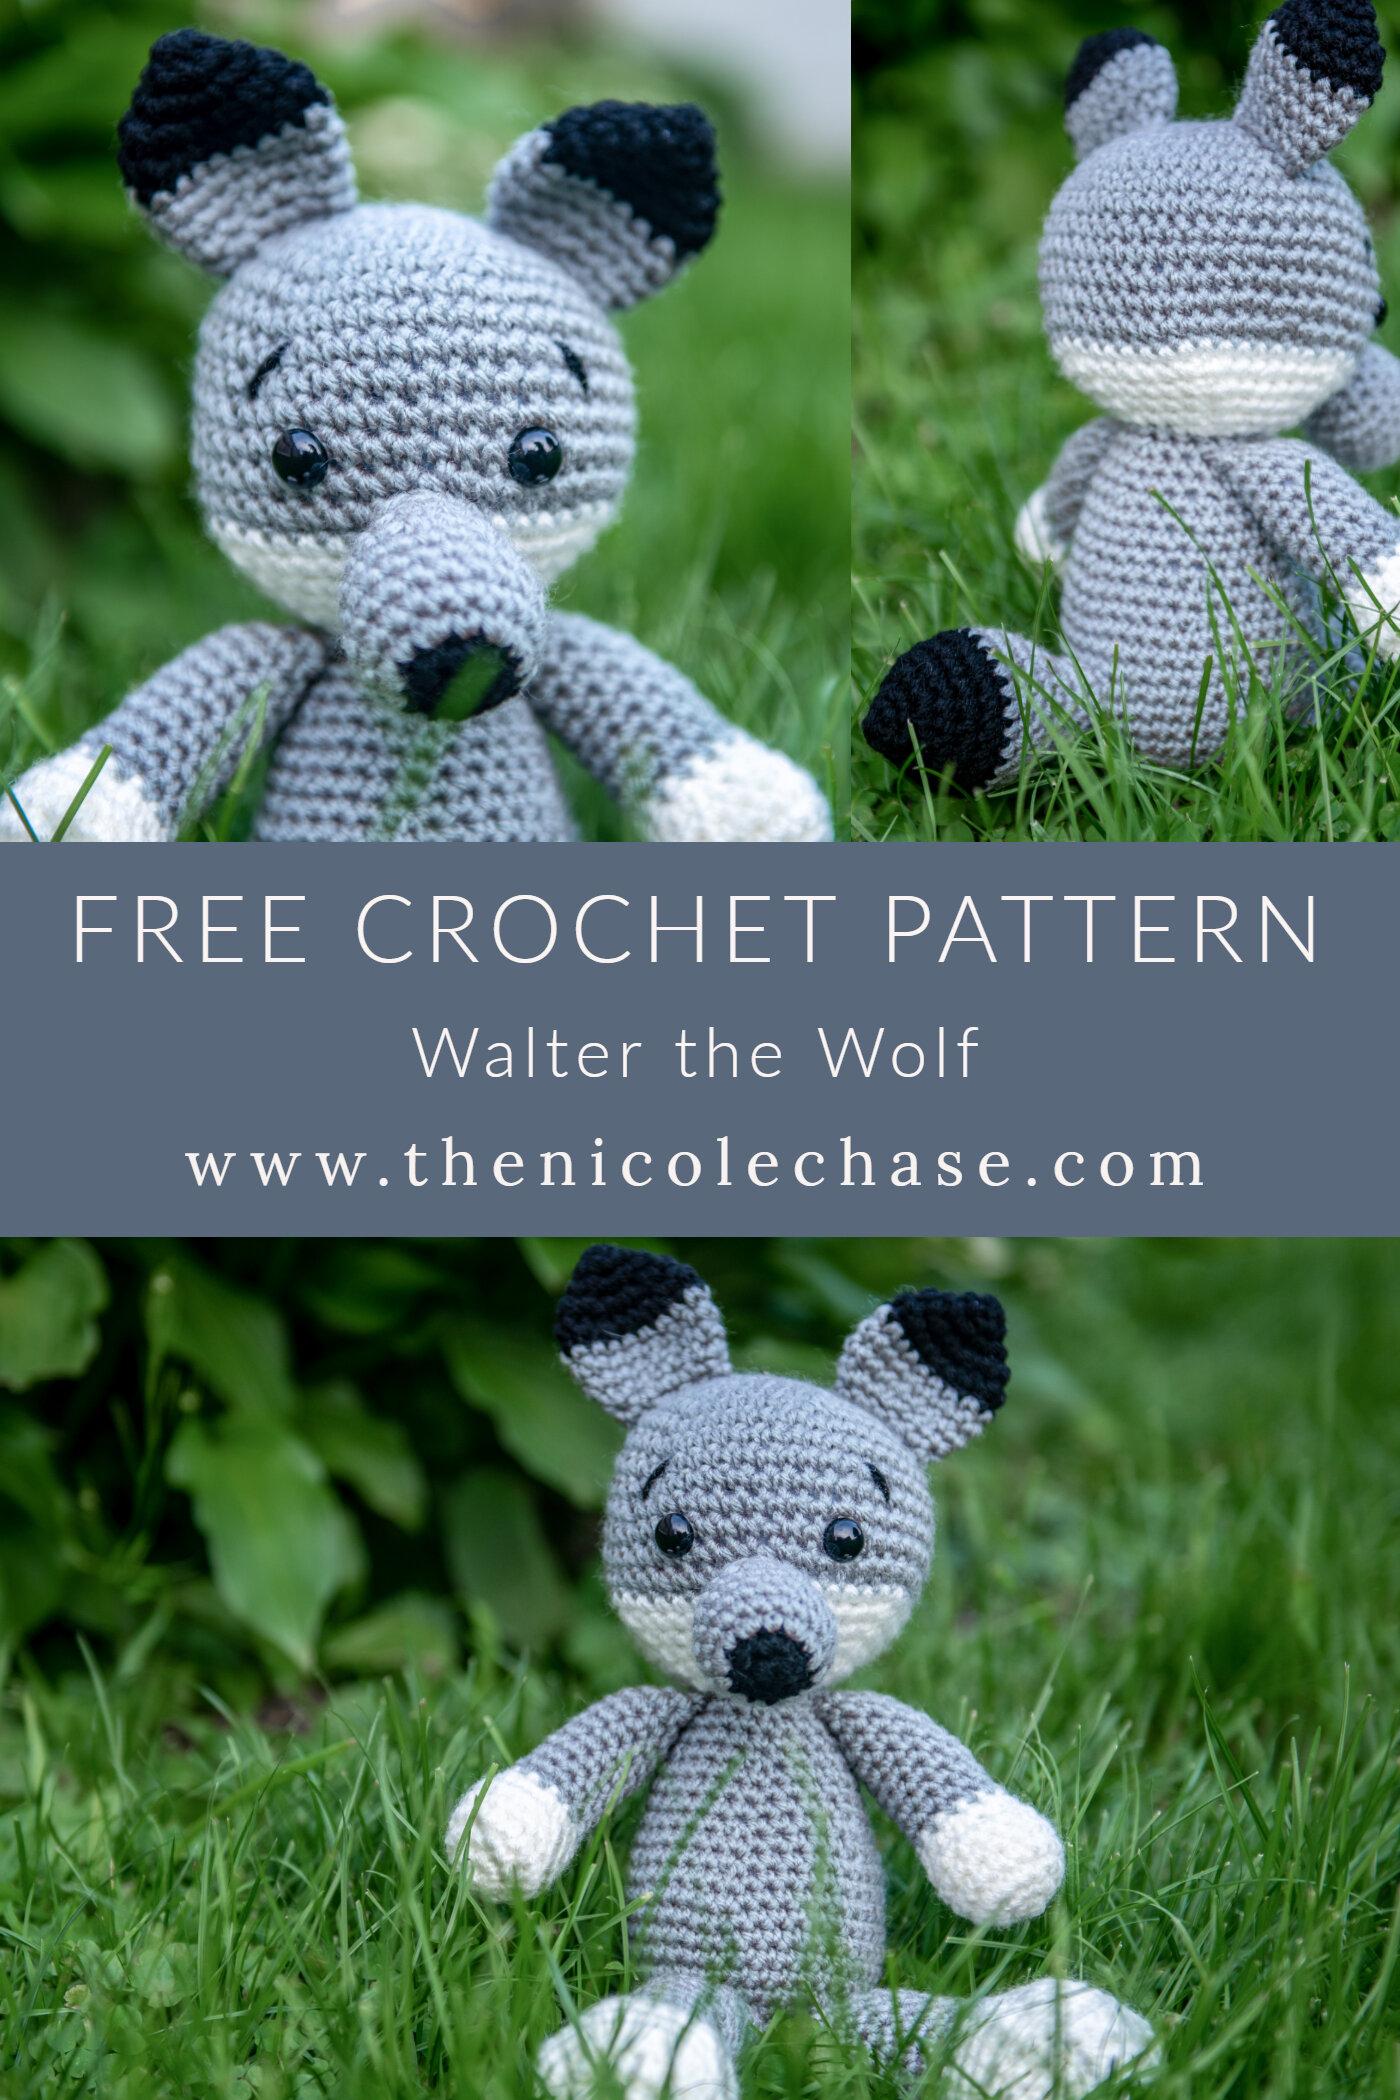 The Three Little Pigs and Big Bad Wolf Amigurumi Free Crochet ... | 1500x1000